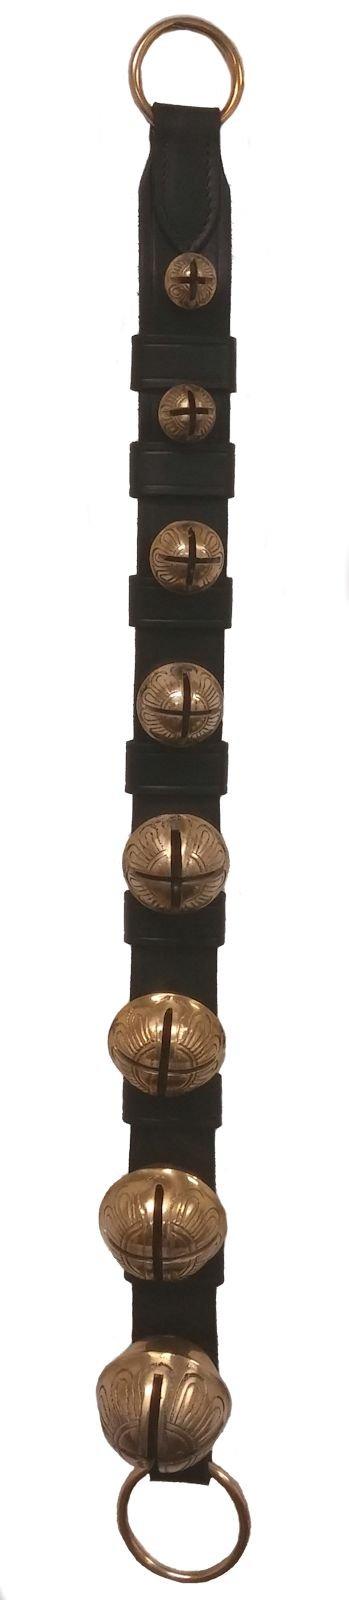 Made in USA Belsnickel 28 Inch Black Leather Solid Brass Sleigh Bell Door Hanger